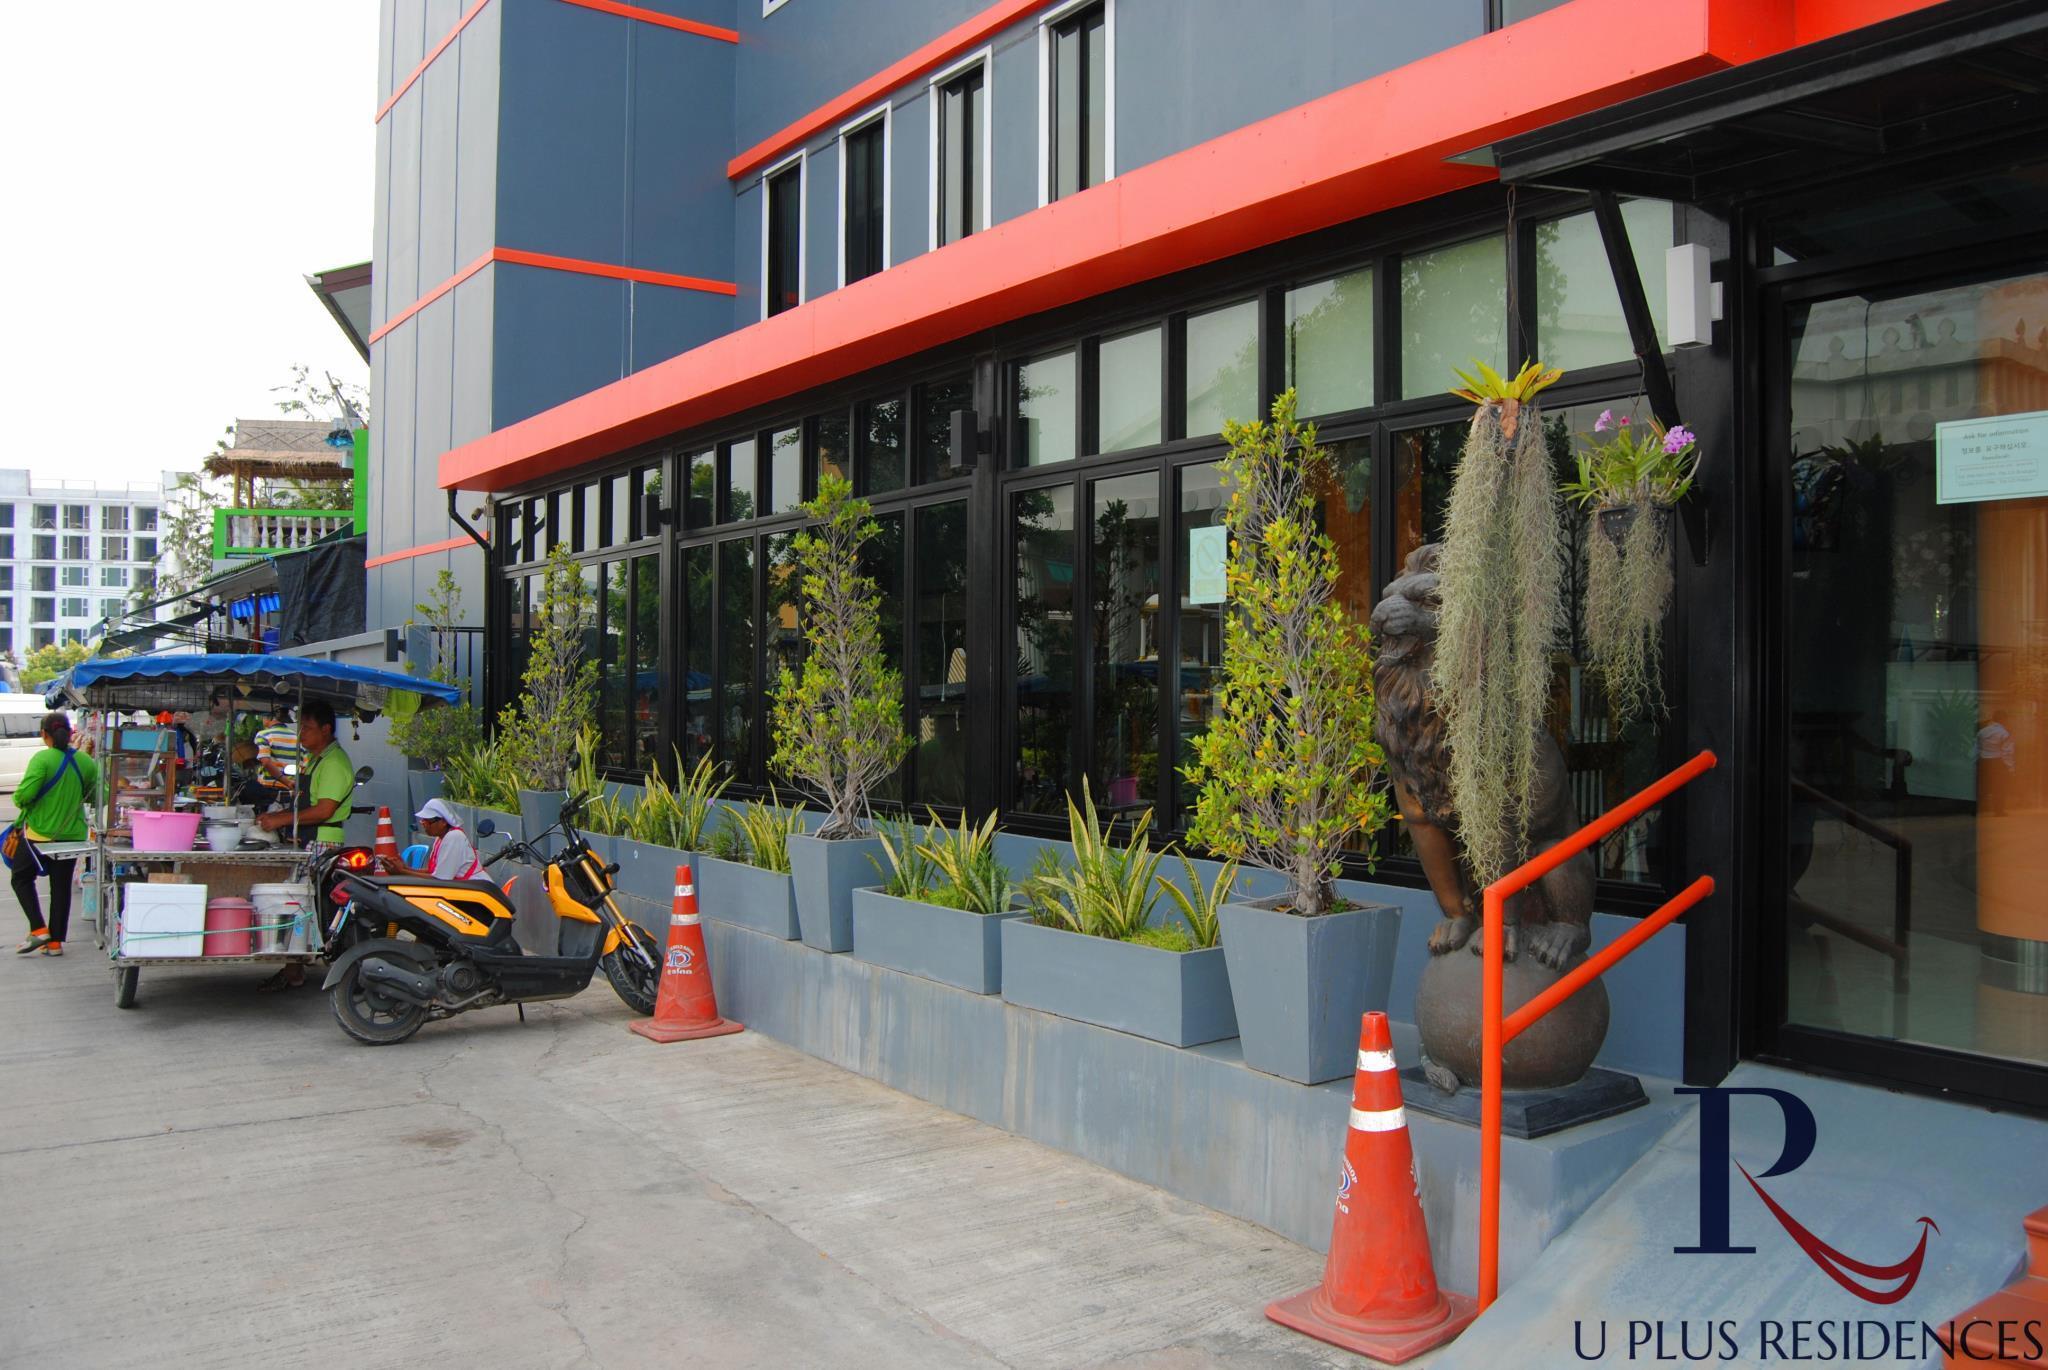 Uplus Uhome Hotel no.2